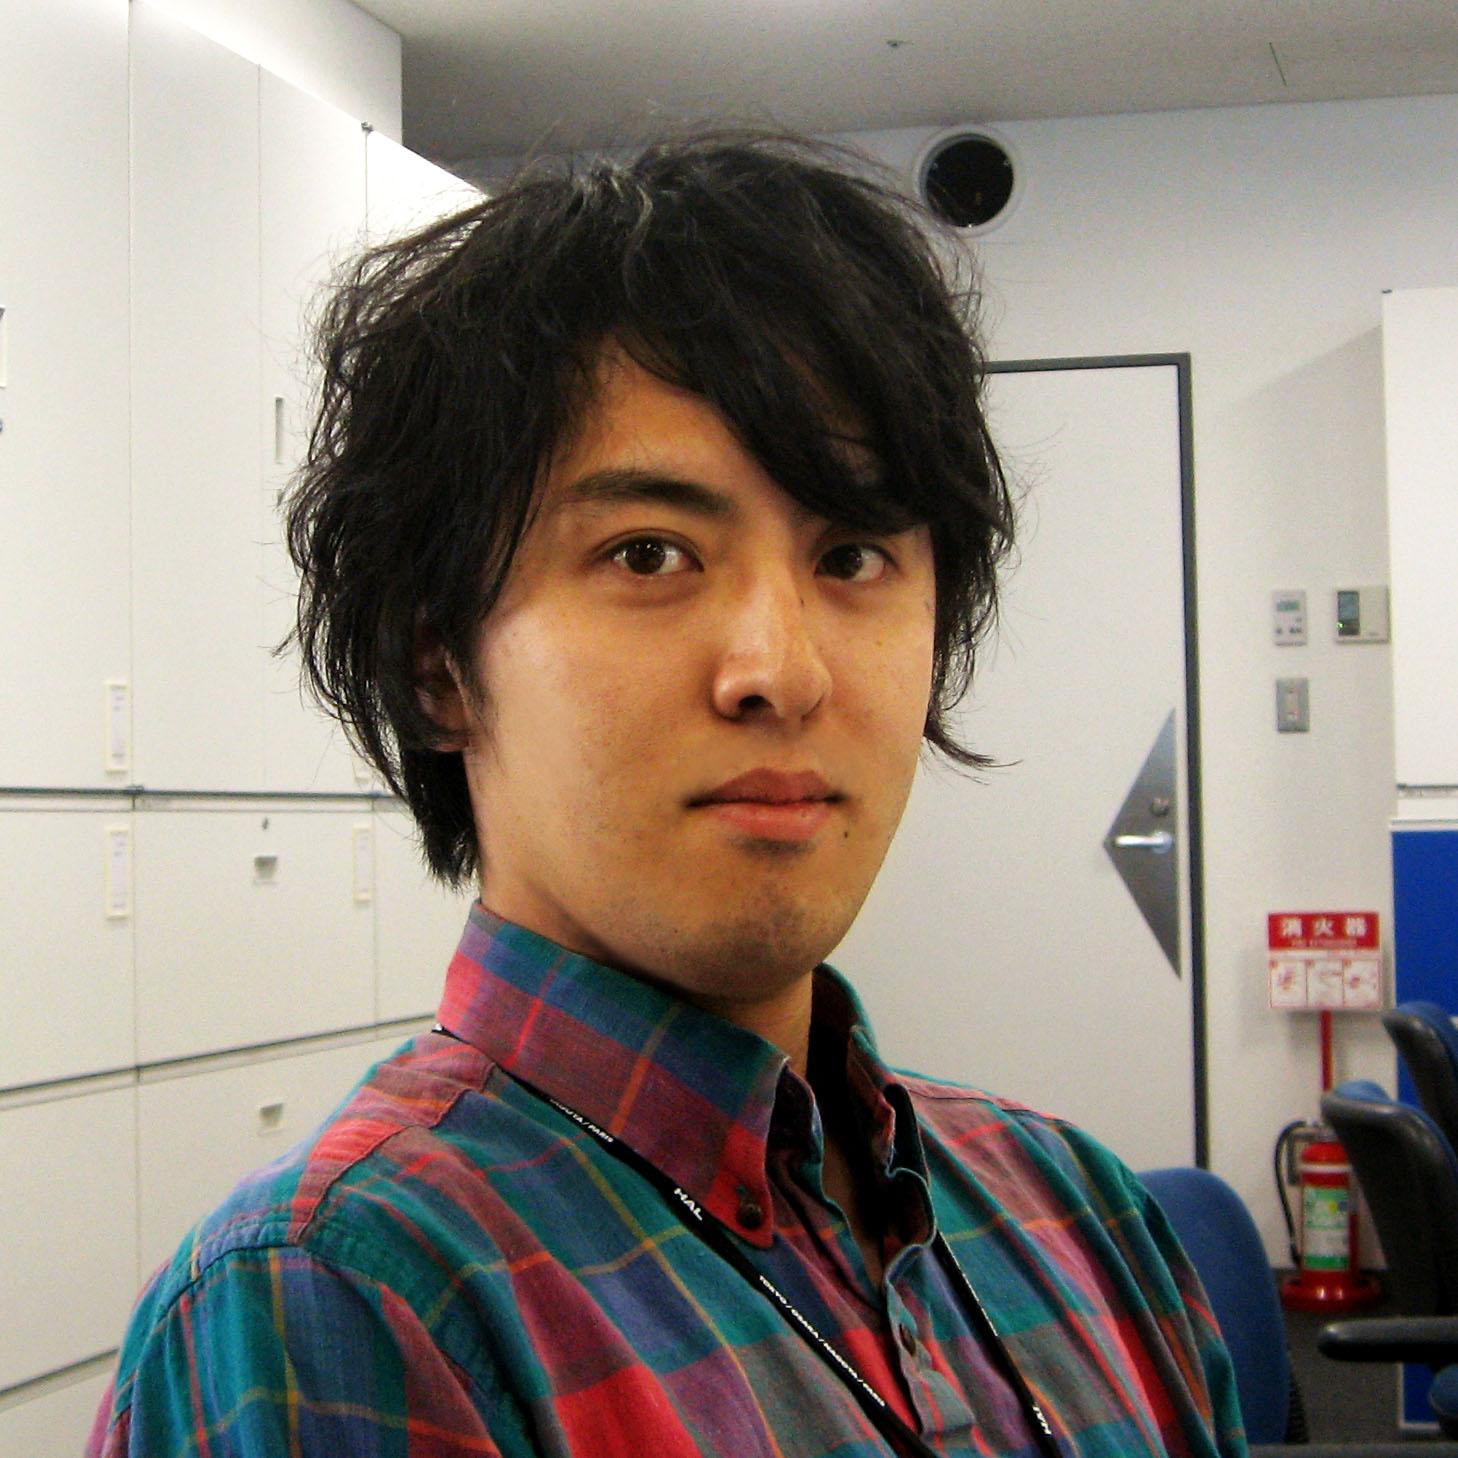 hironobu_2.jpg